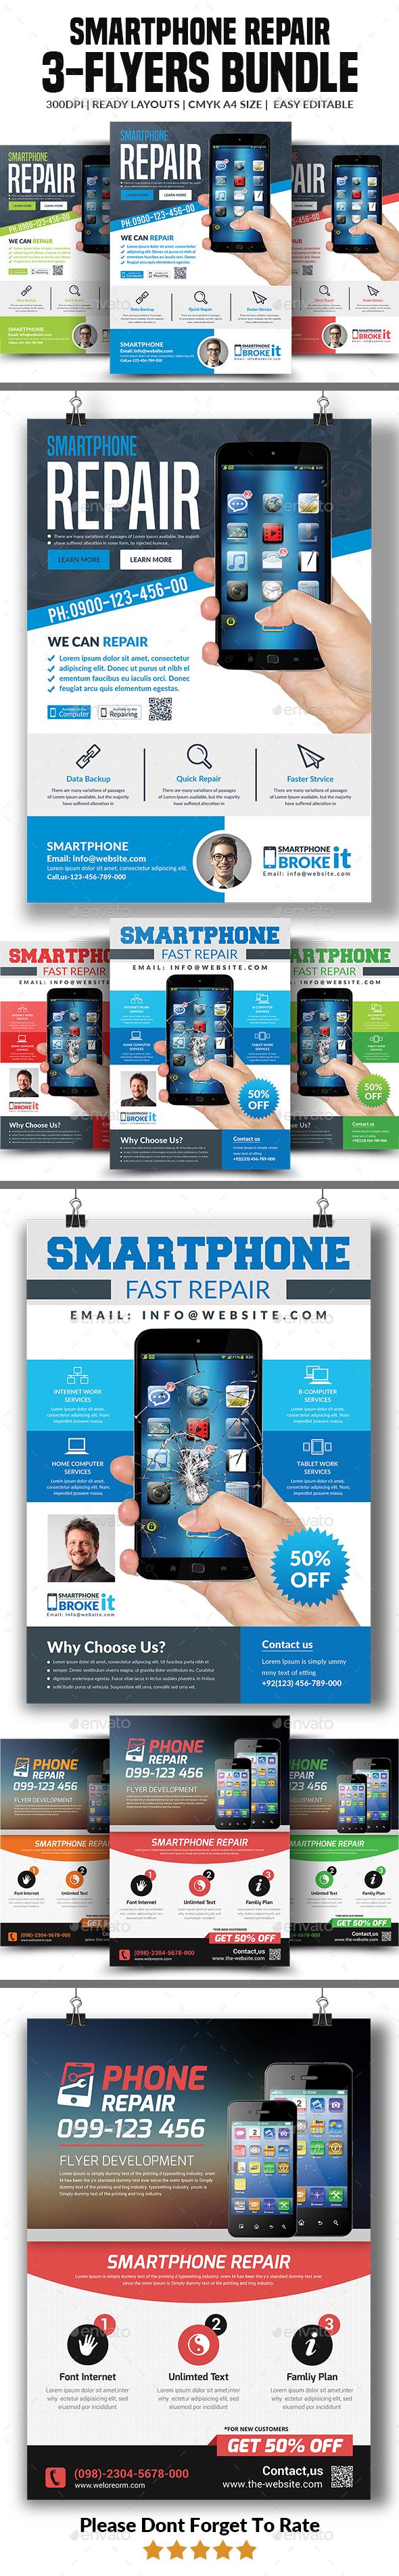 Smartphone Repair Flyers Bundle - Corporate Flyers